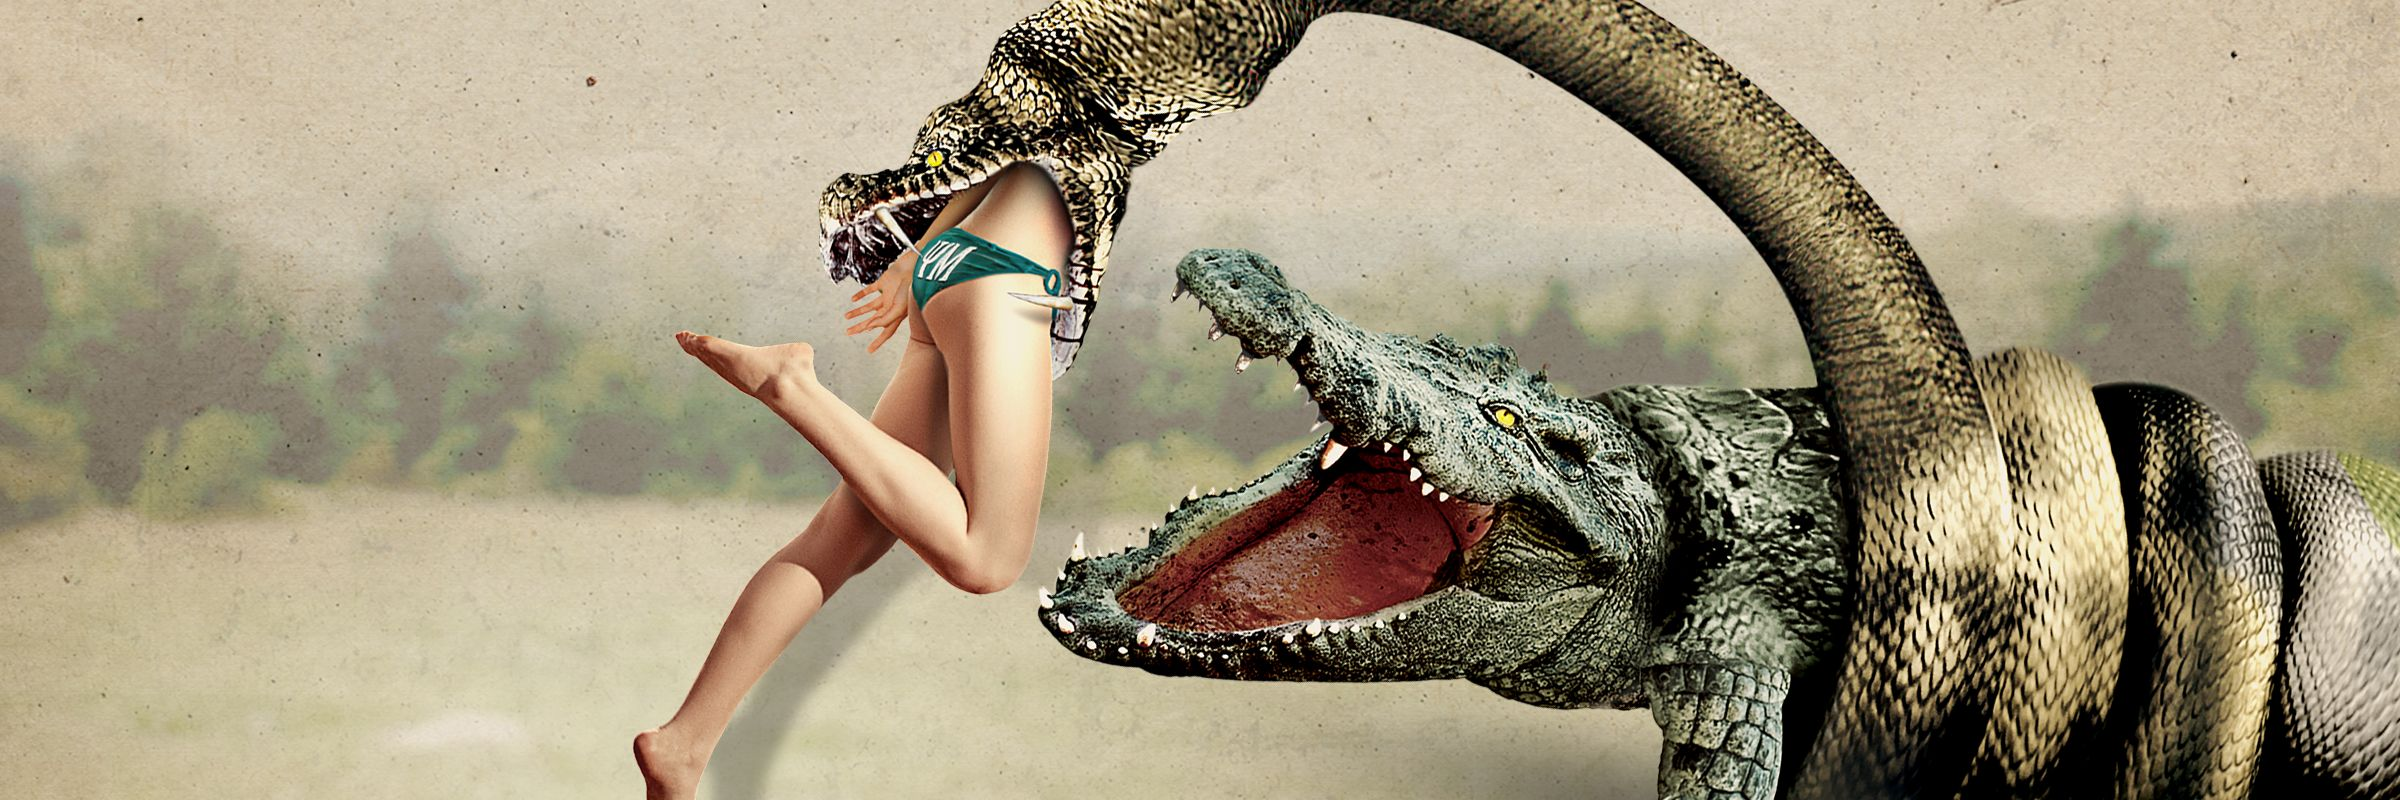 Anaconda Vs Lake Placid Full Movie lake placid vs. anaconda   full movie   movies anywhere